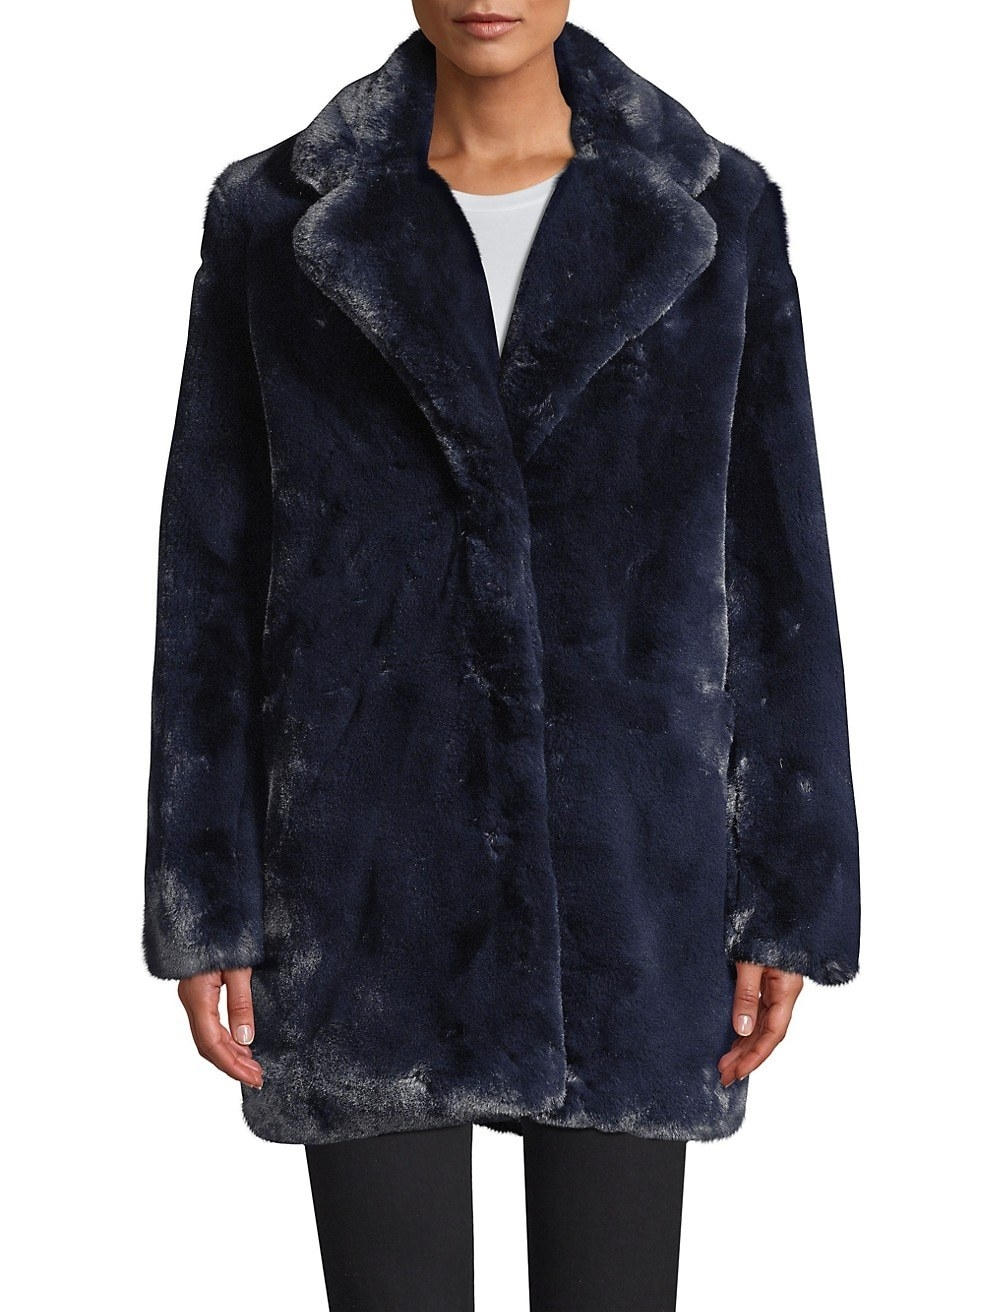 Model in the hip-length coat